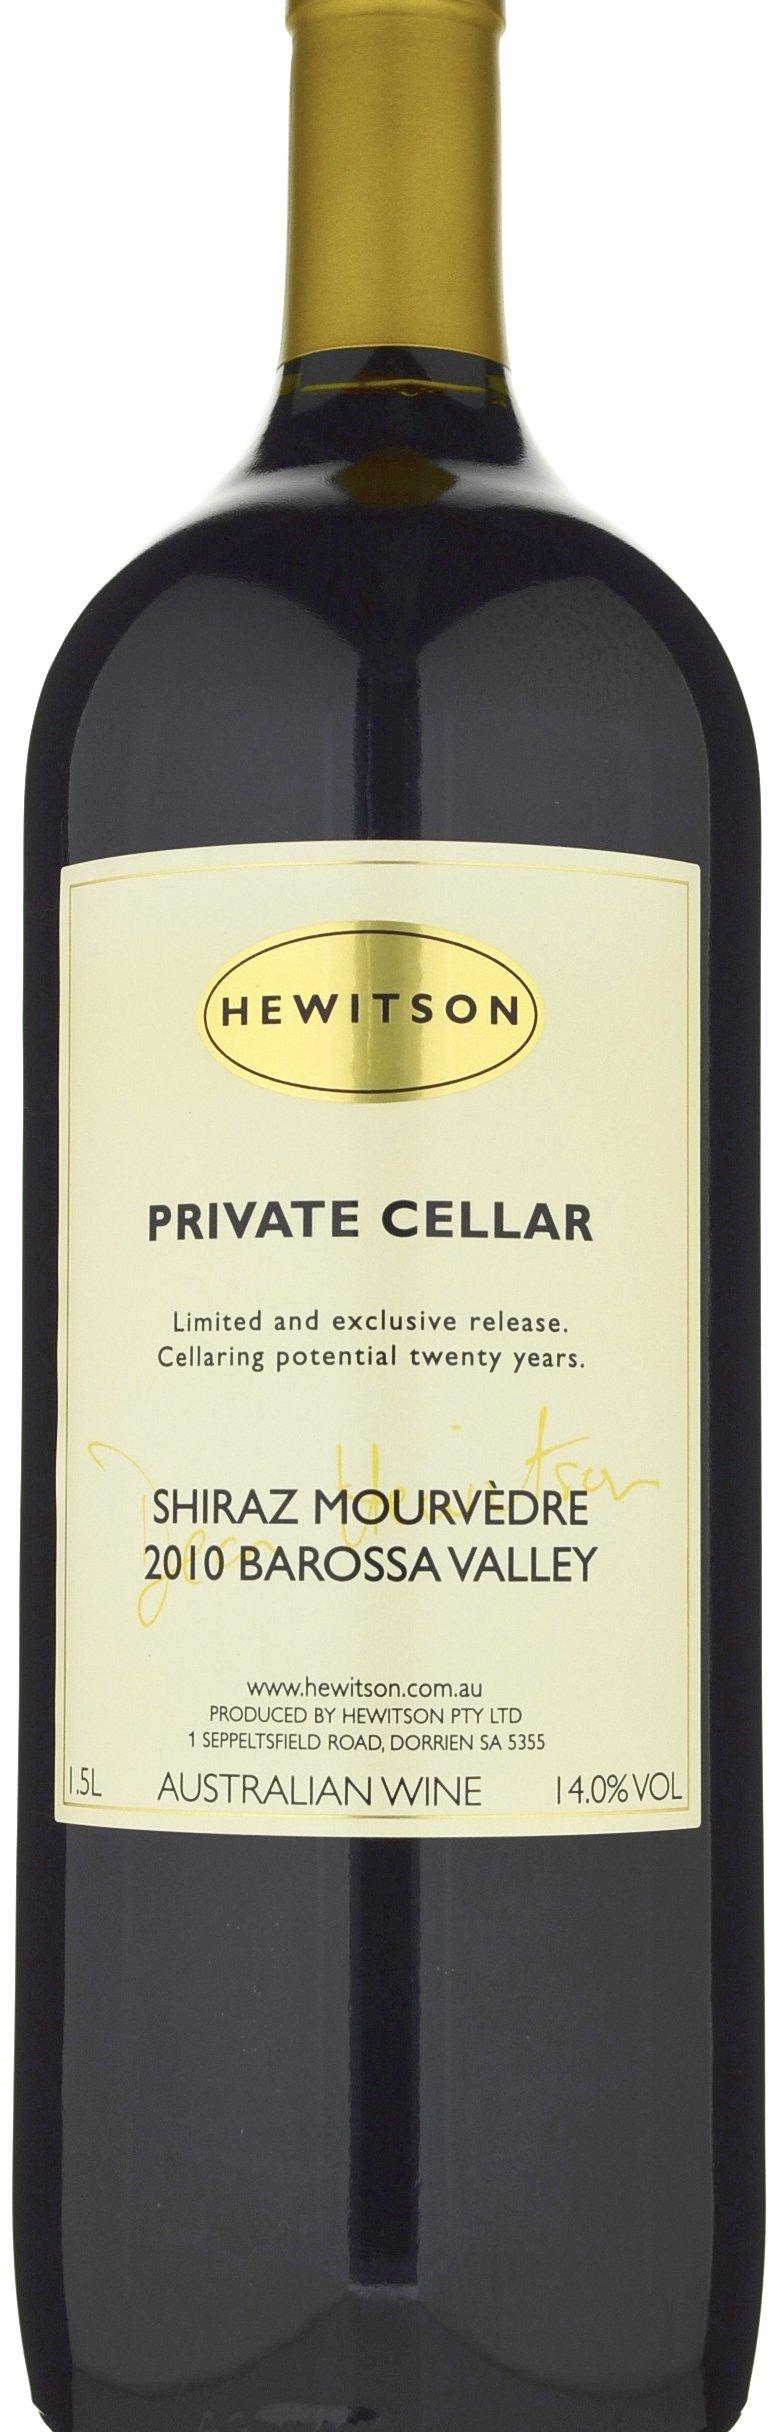 Hewitson 'Private Cellar' Shiraz-Mourvedre 2003-1482